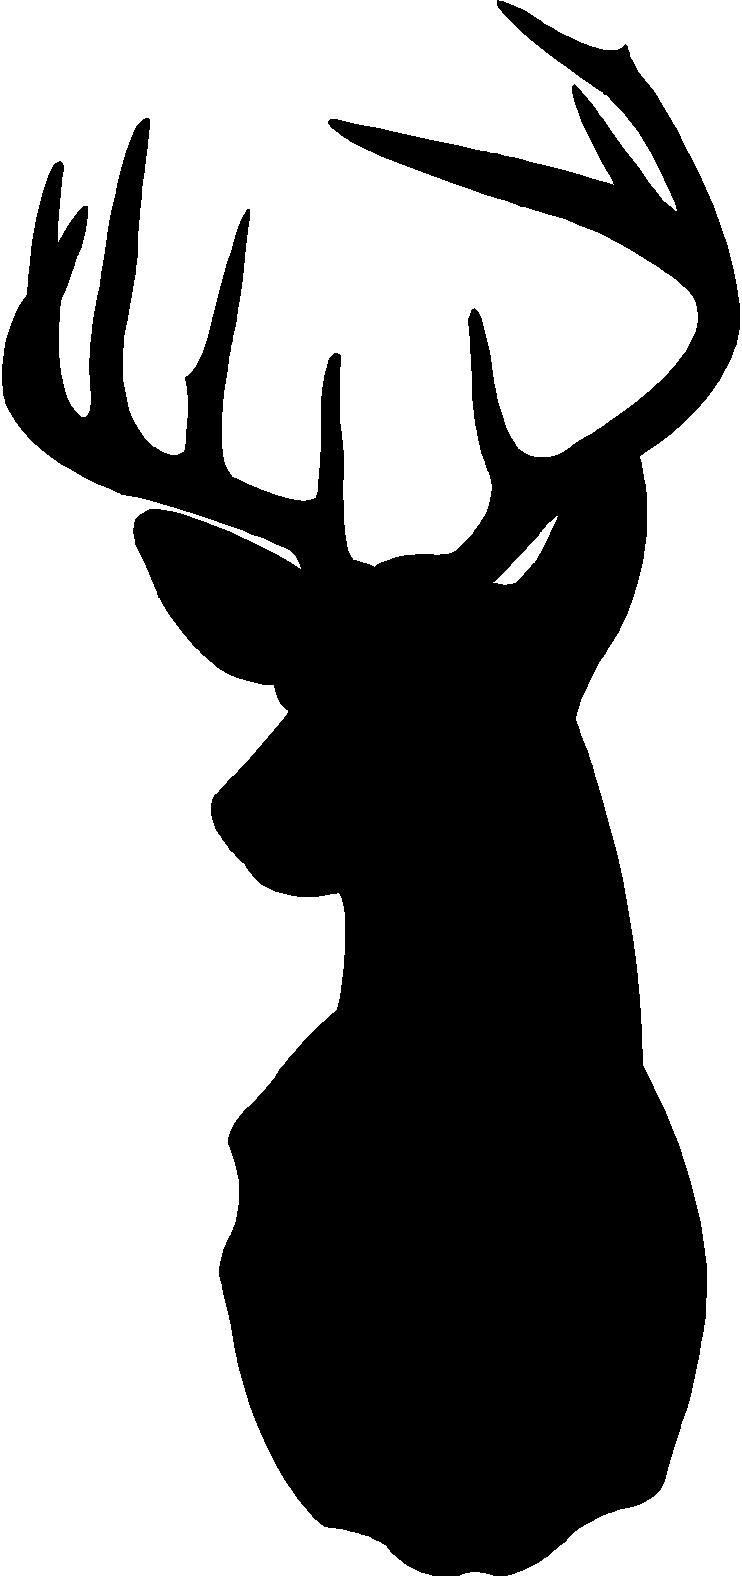 Pin By Opal Cain On Cameo Deer Head Silhouette Deer